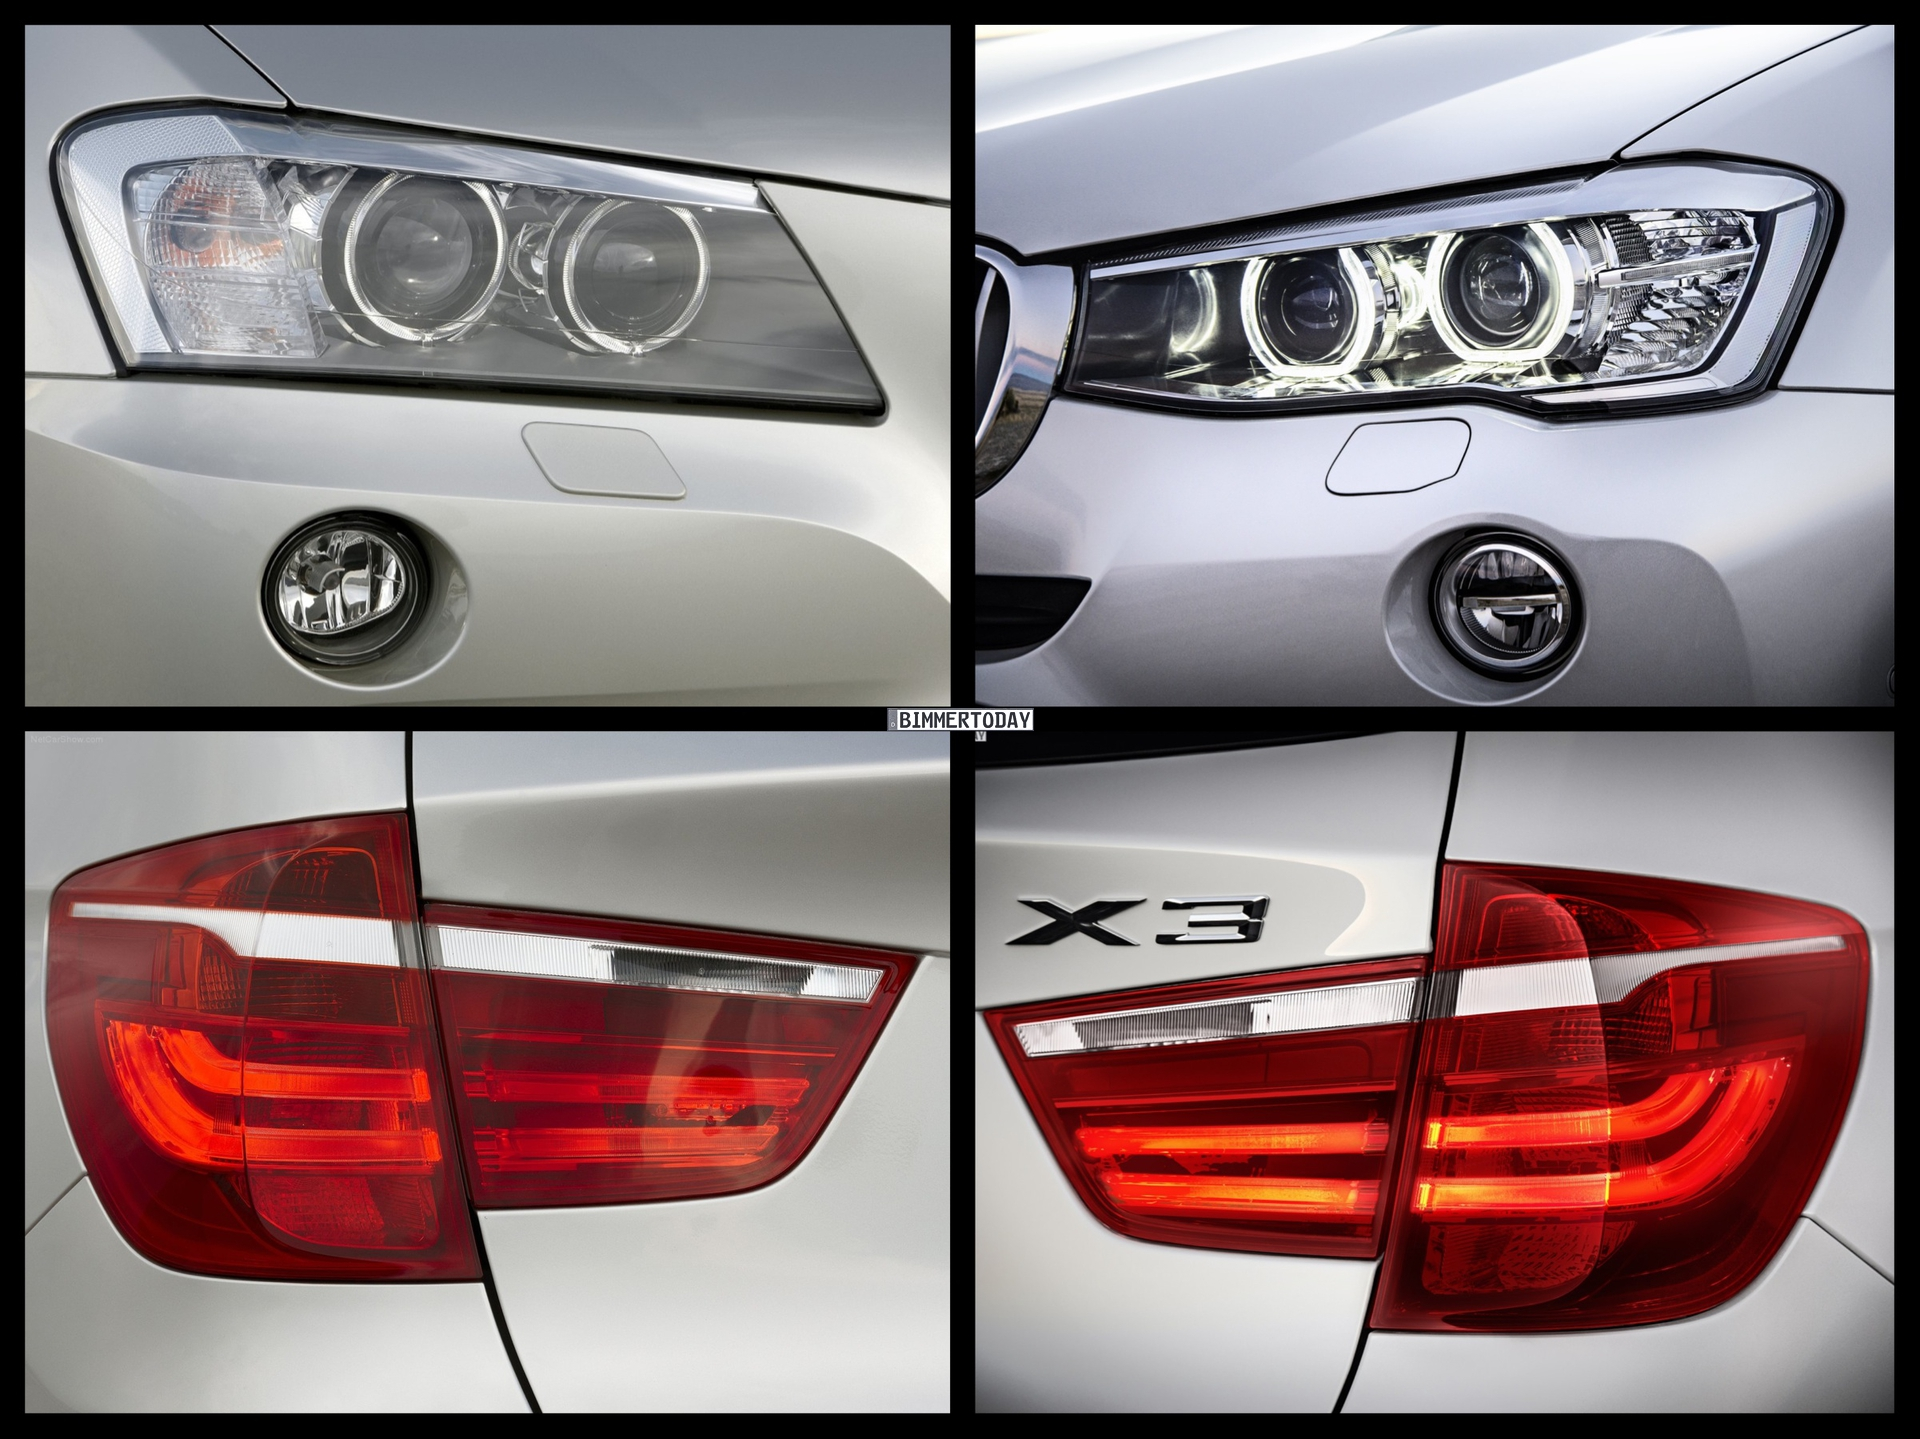 Bild Vergleich BMW X3 F25 XDrive Facelift LCI 2014 05 750x562